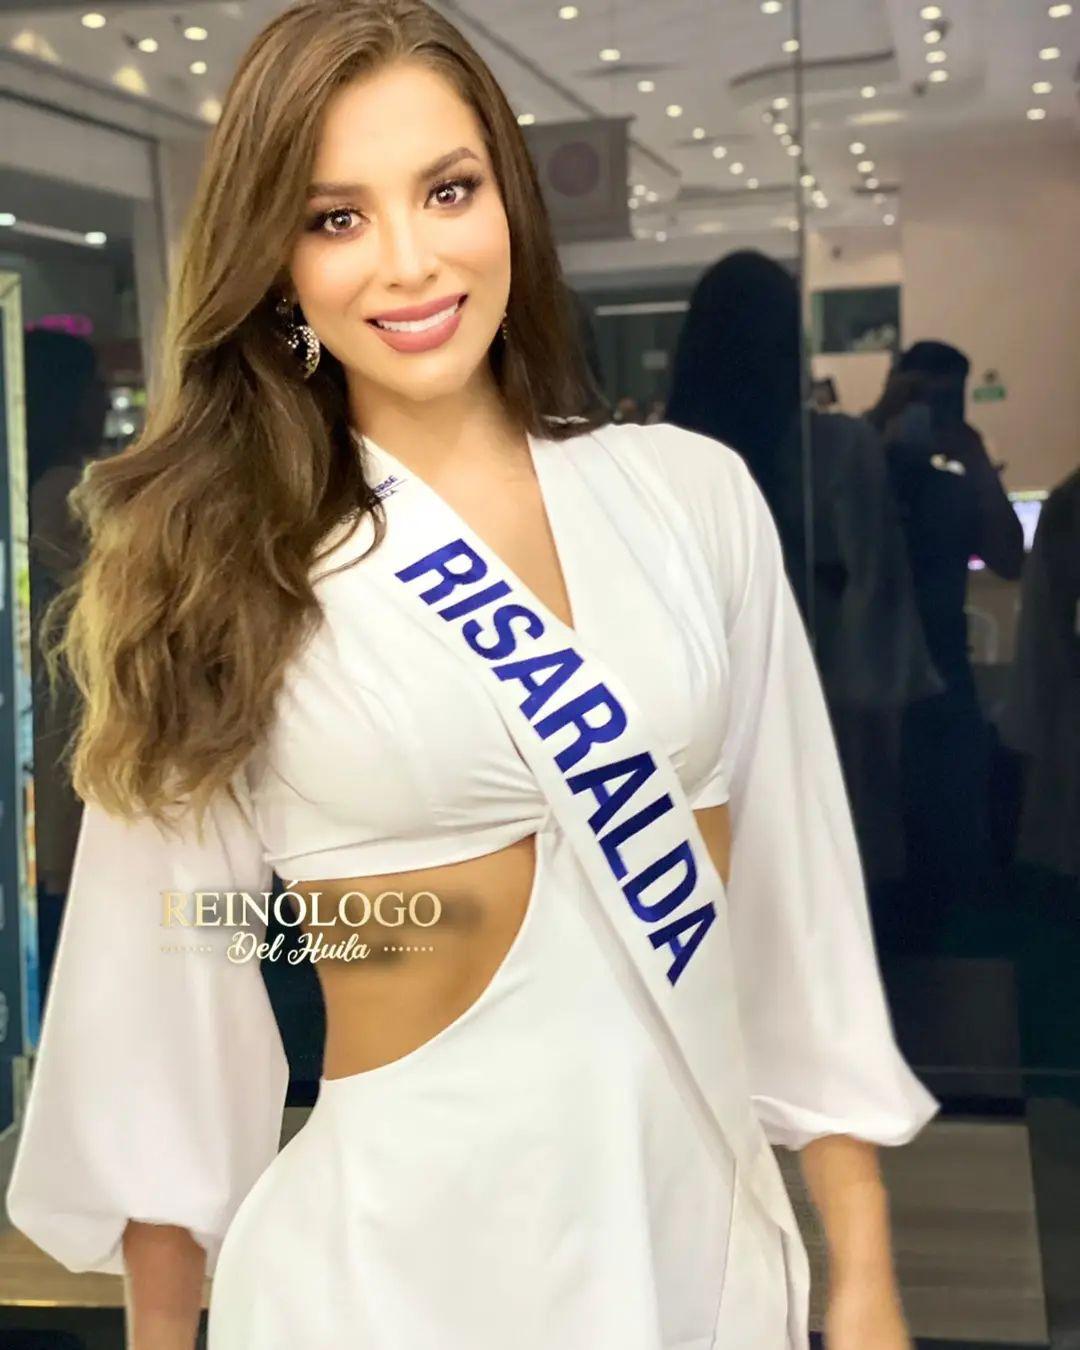 maria alejandra lopez perez, top 2 de miss universe colombia 2021/reyna hispanoamericana 2013/miss caraibes hibiscus 2014/miss colombia mundo 2015. - Página 4 24058013